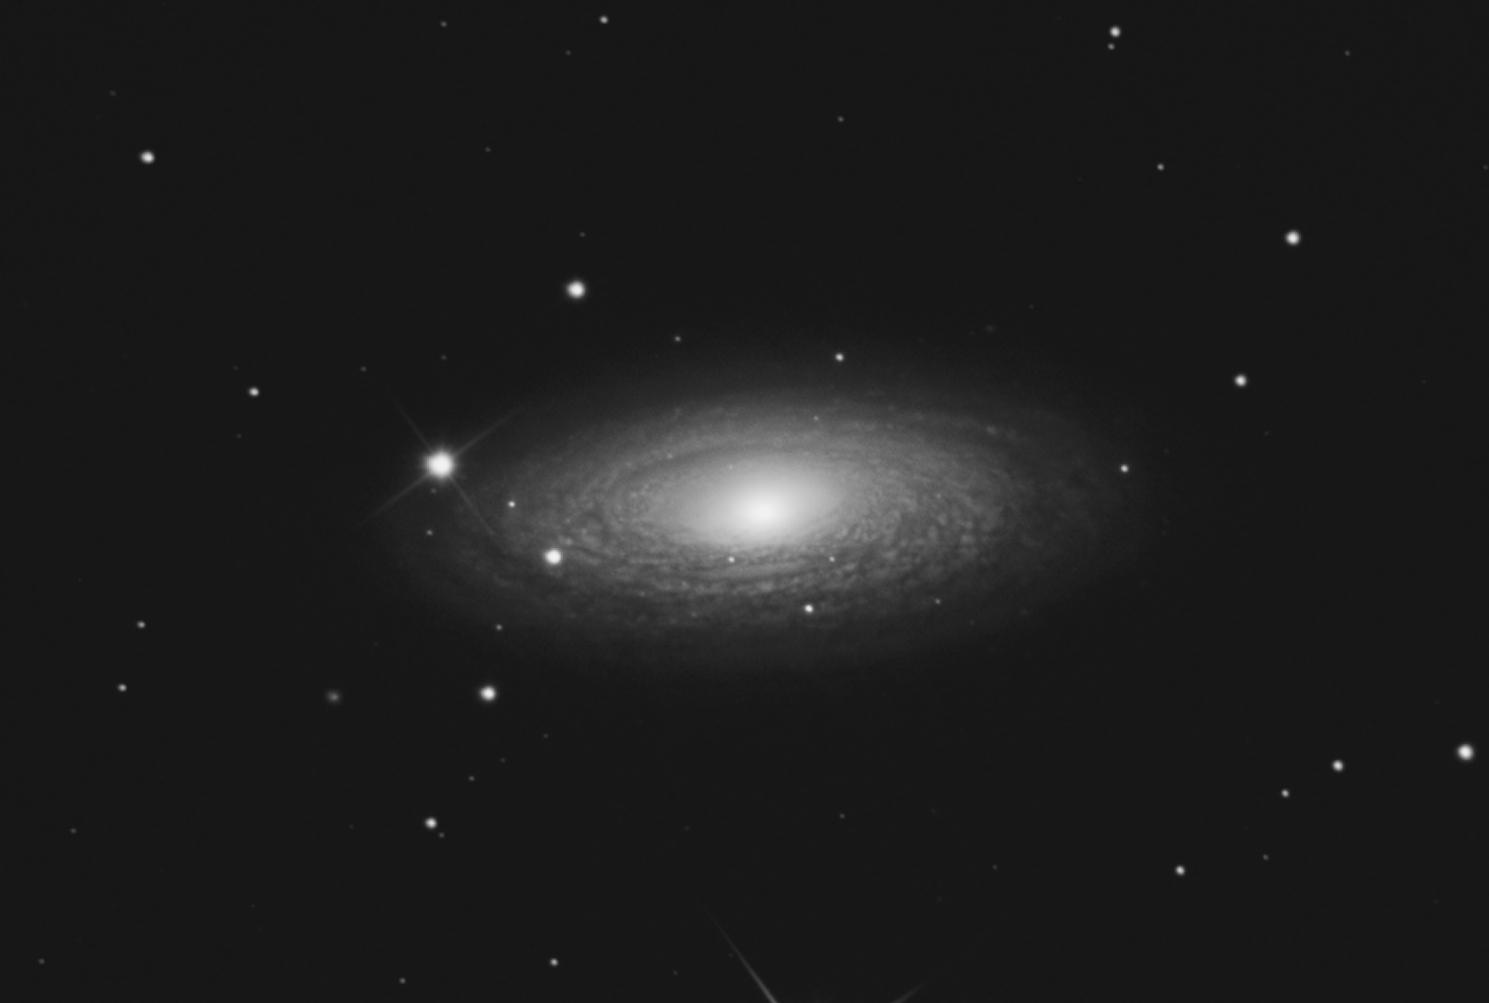 Deep Sky Planetary Technique (by Shaihulud) L1tnNSuV89kA_16536x16536_wmhqkGbg